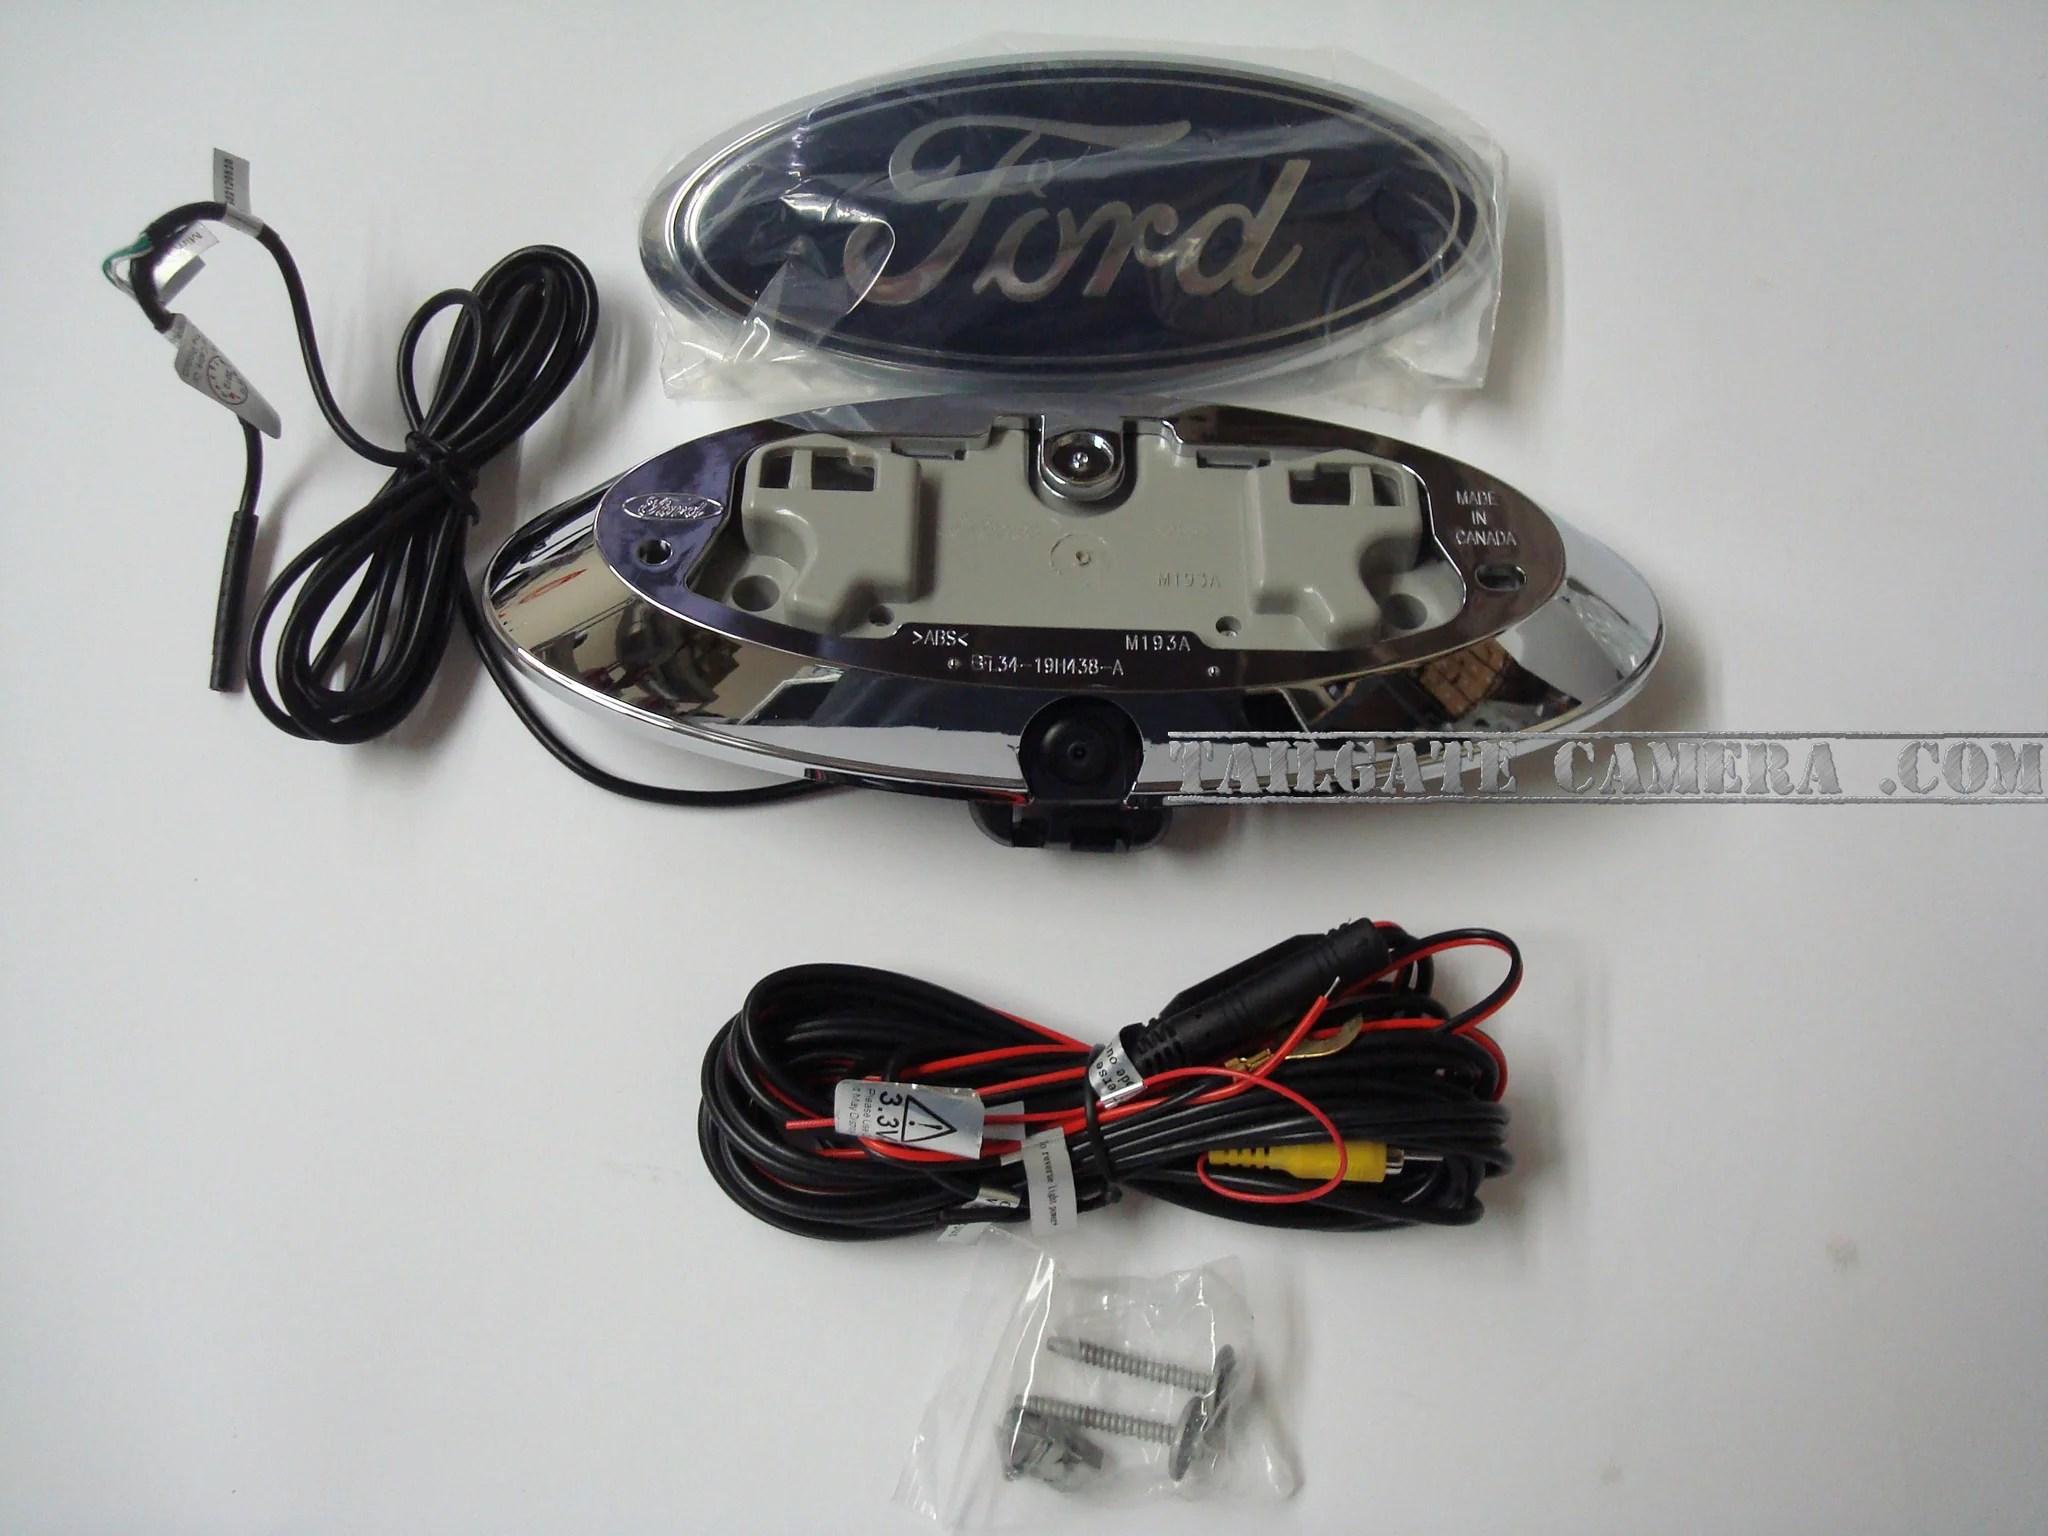 2007 ford f 250 oem wiring harness wiring diagram best data 2003 ford f 250 mirror wiring harness [ 2048 x 1536 Pixel ]